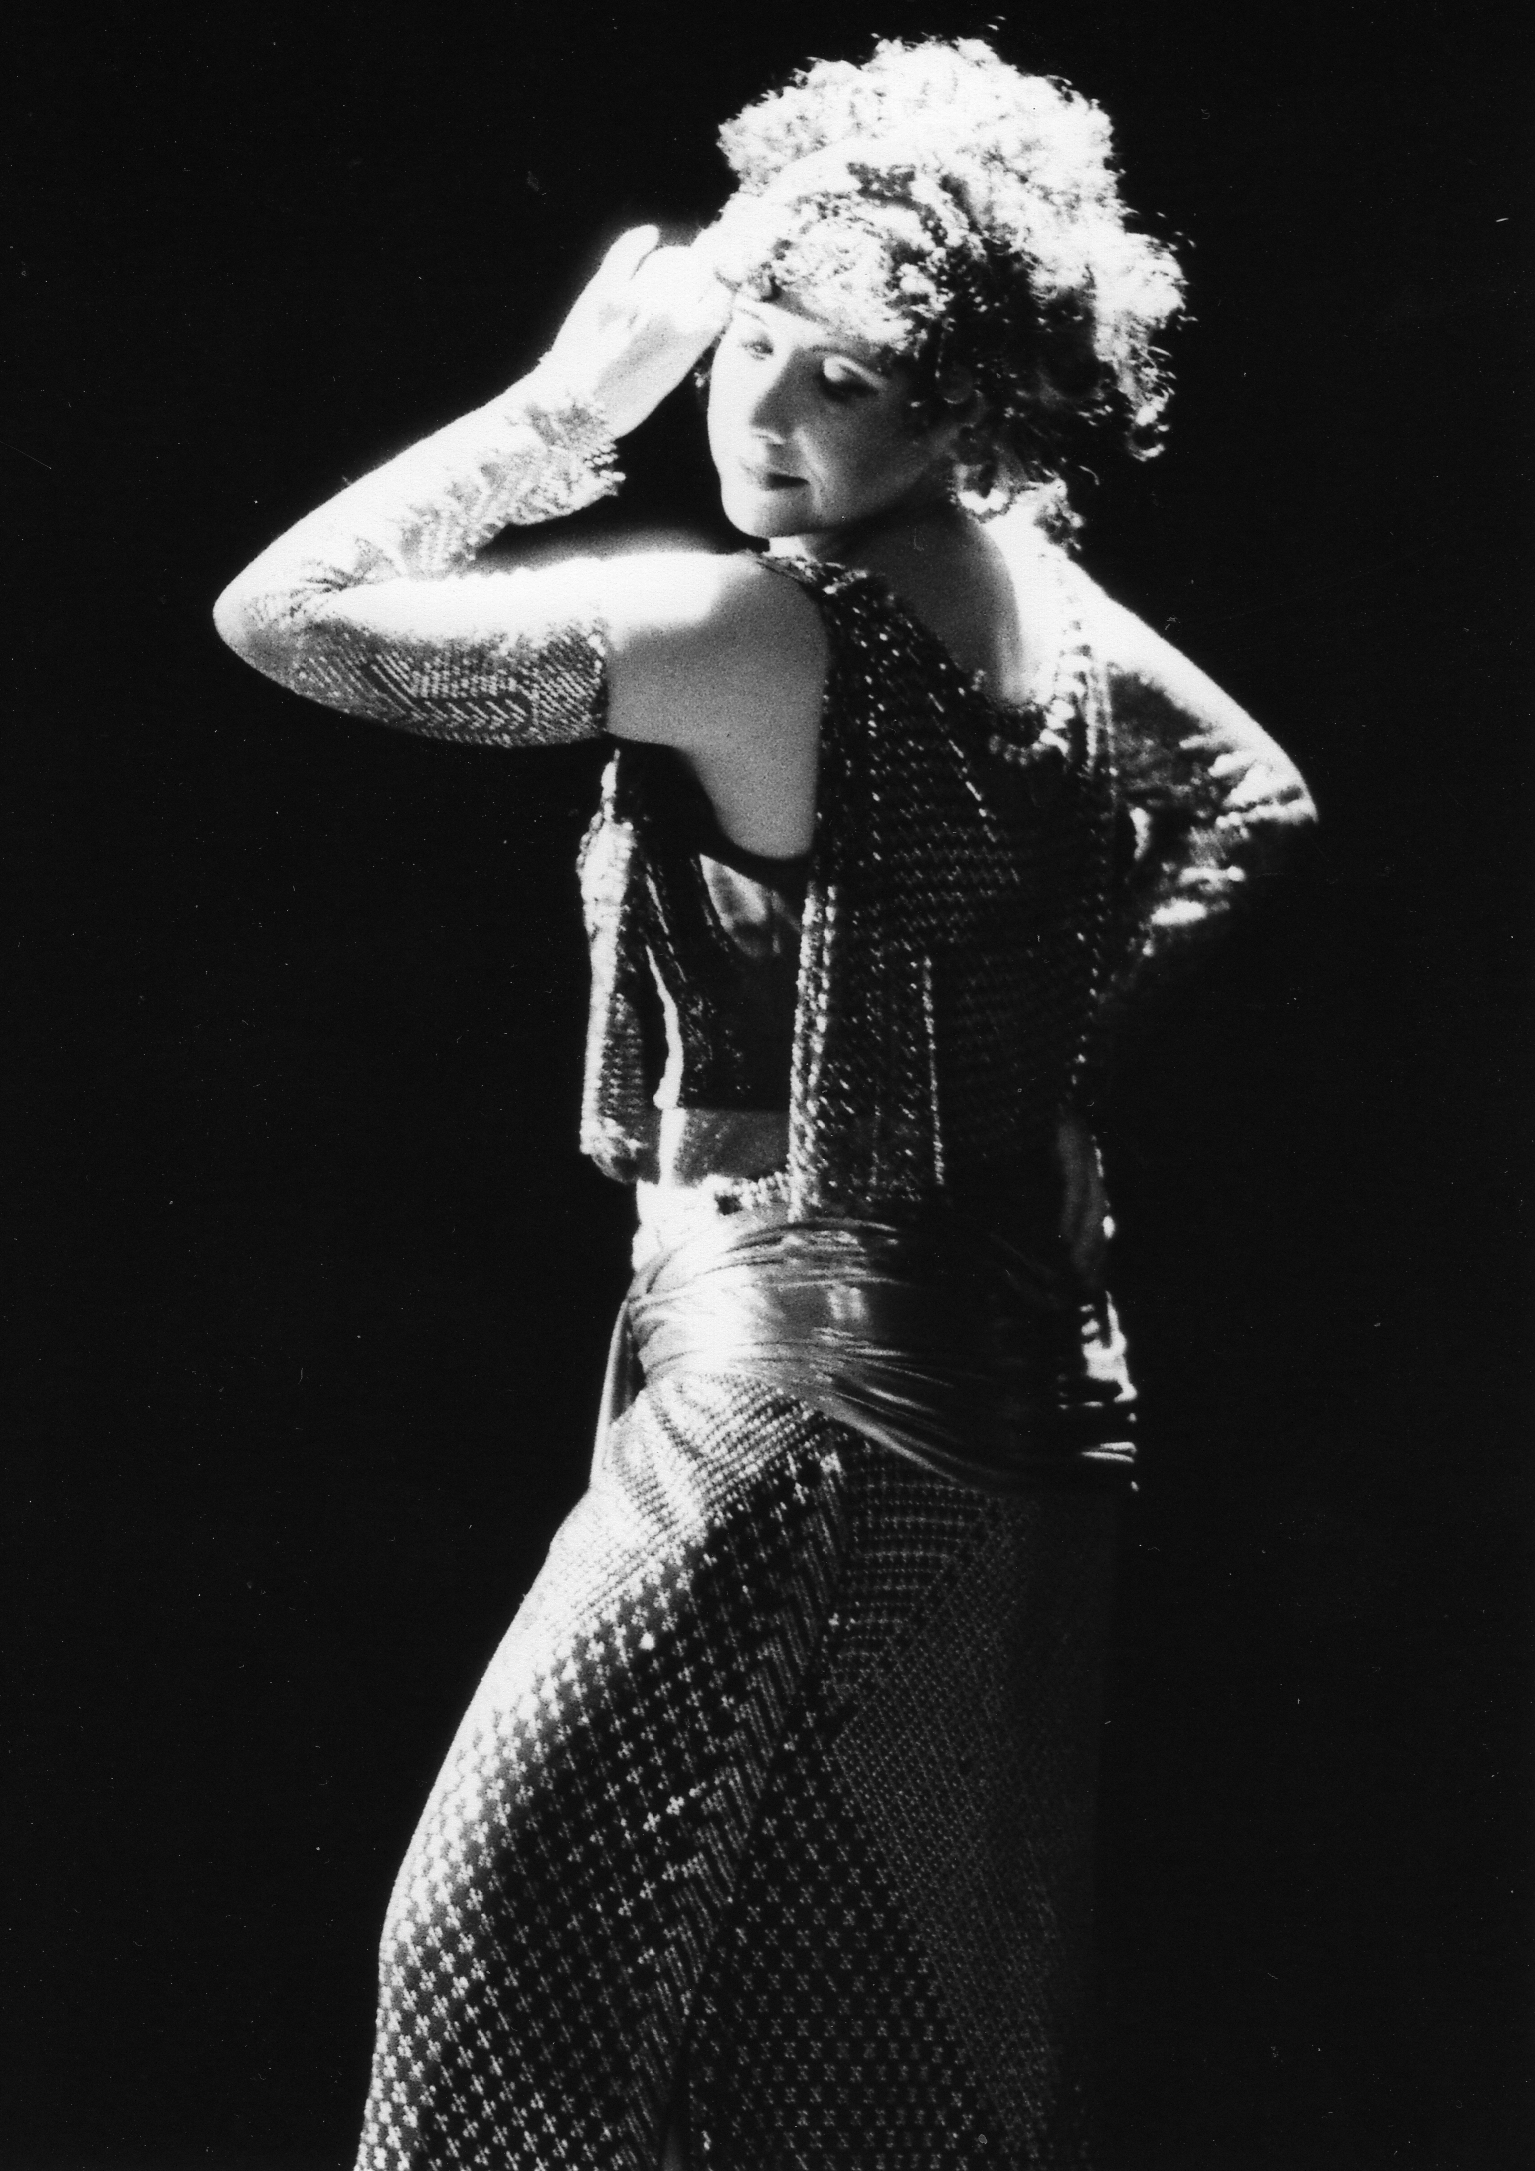 Wendy Buonaventura